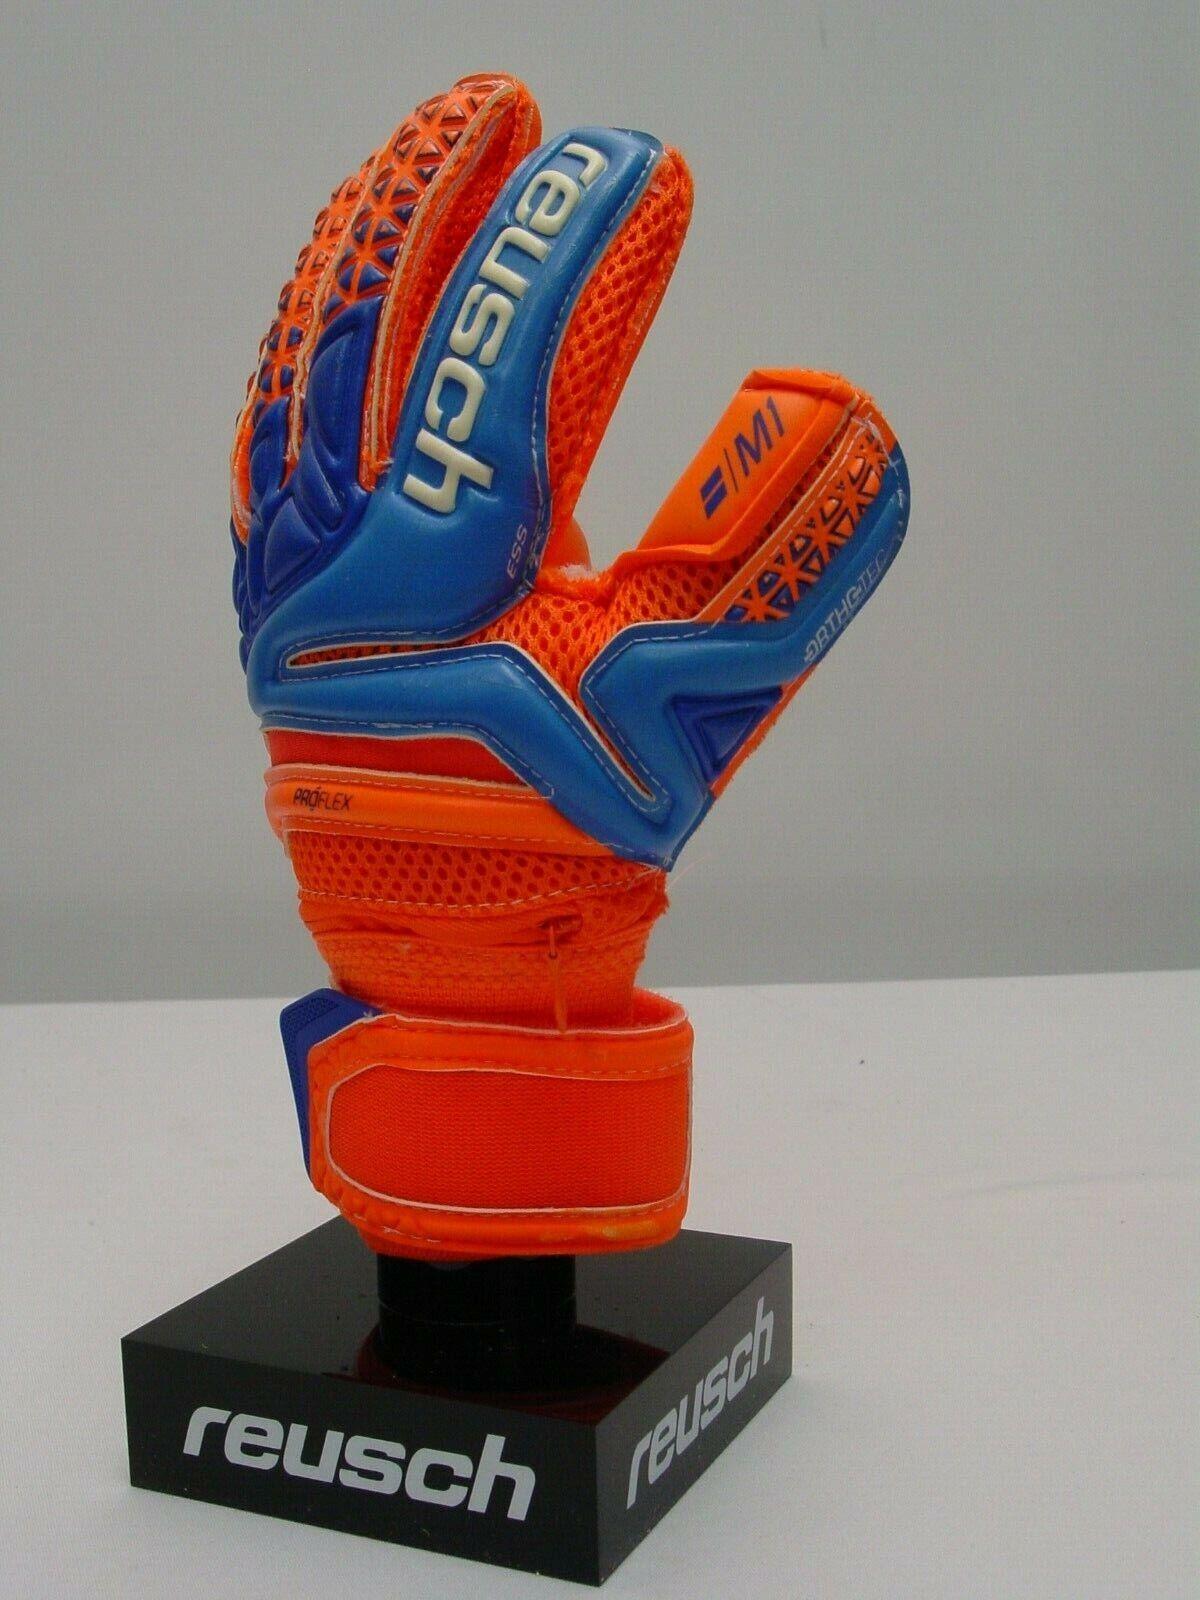 Reusch Fußball Fußball Fußball Torwarthandschuhe Prisma pro M1 Ortho Tec Finger Streben 3872150s 87ce4b